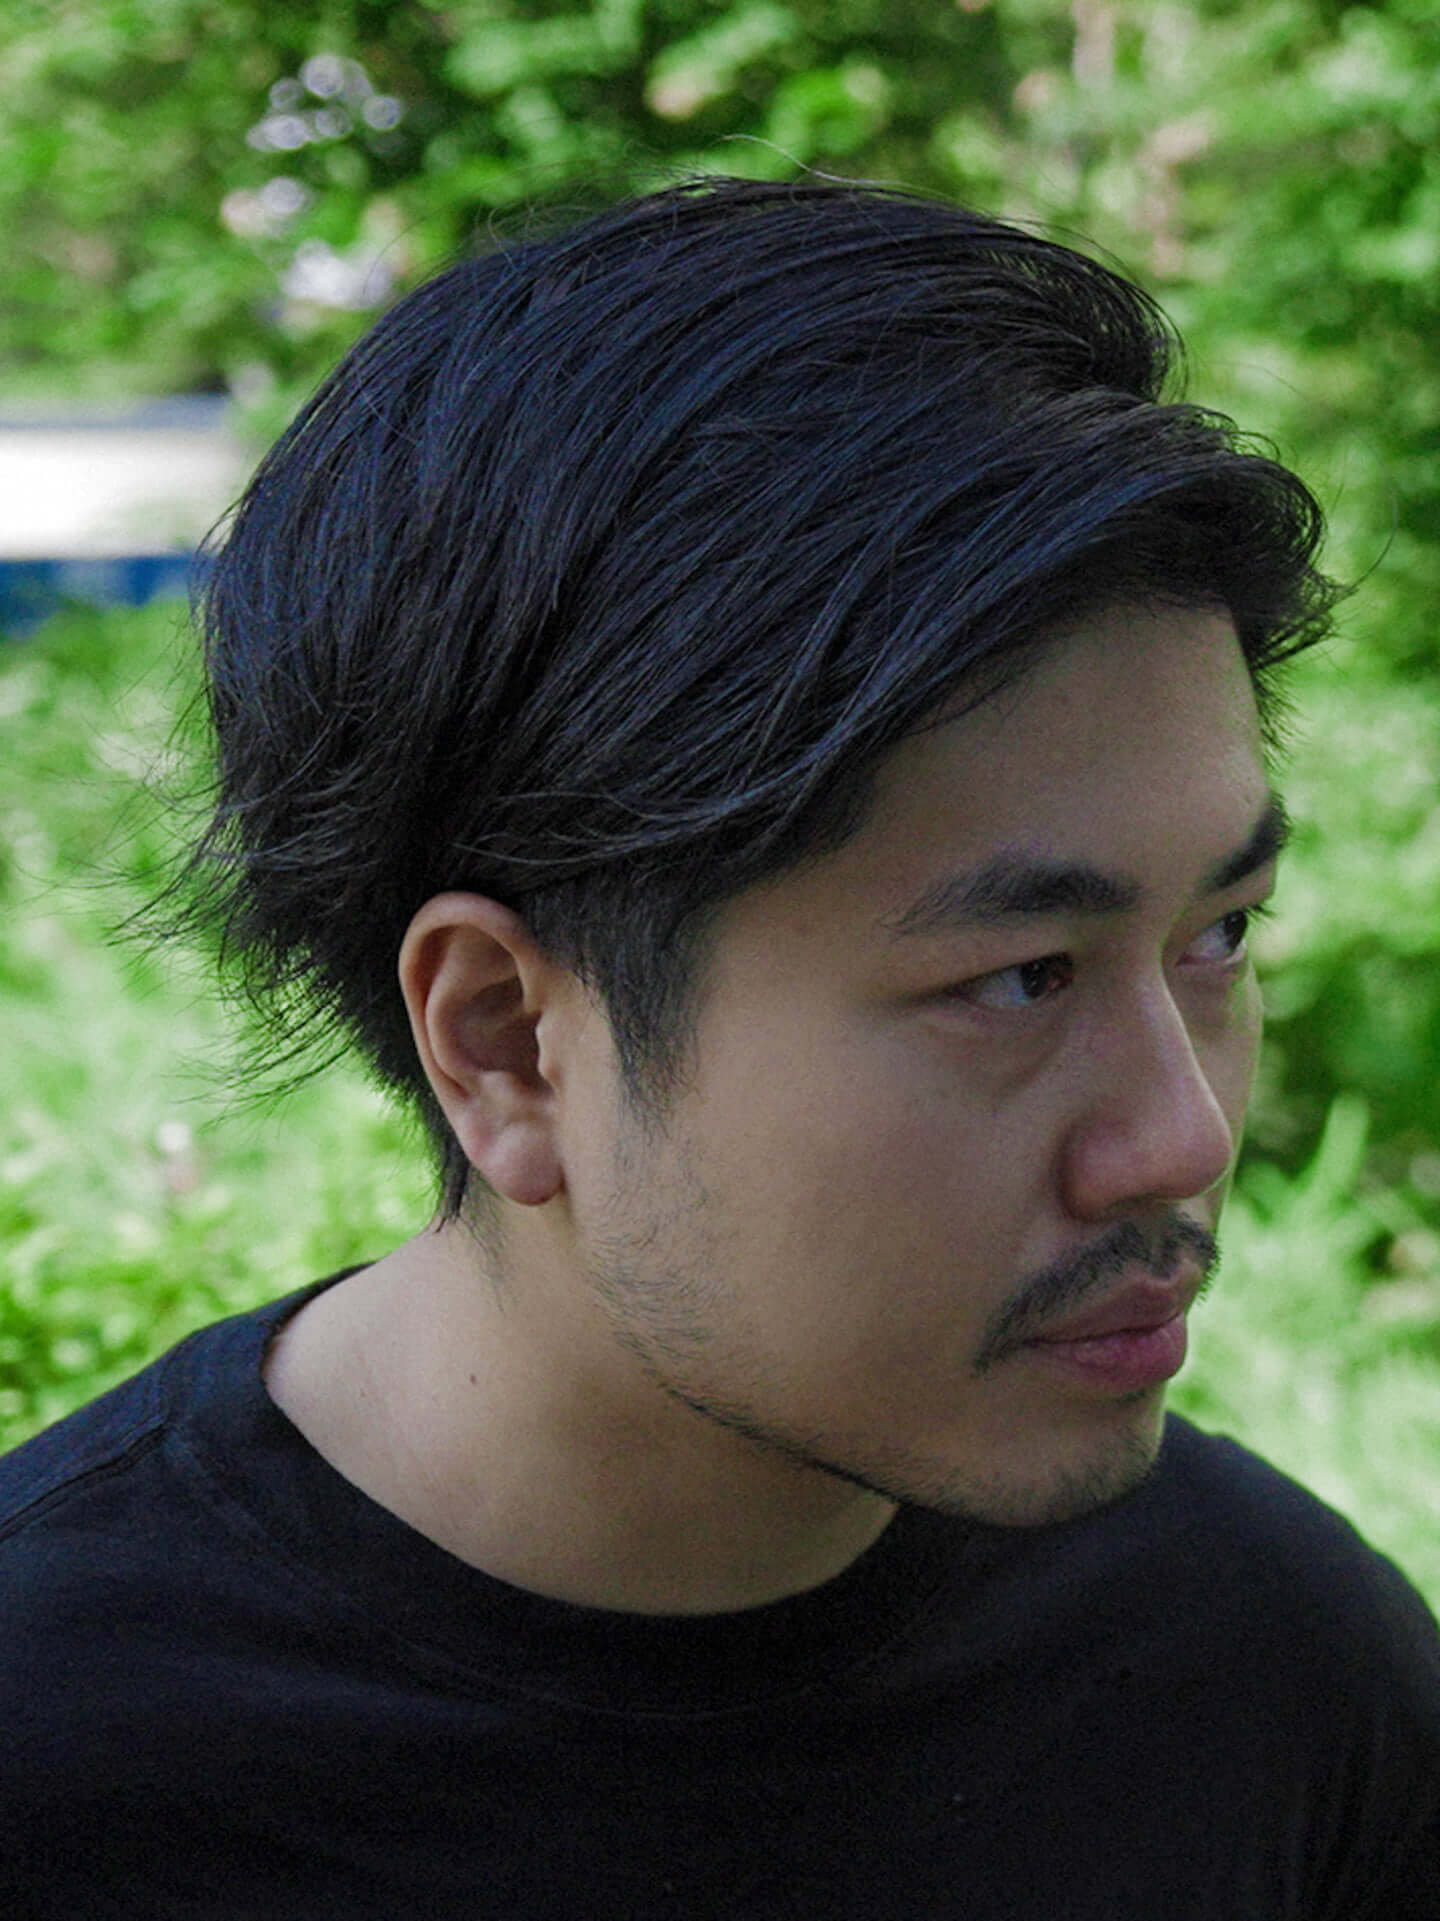 SEEDAの歴史的名盤『花と雨』を原案とした映画が2020年に公開決定!新進俳優・笠松将が主演、演技指導を仙人掌が担当 tsutiya-1440x1921